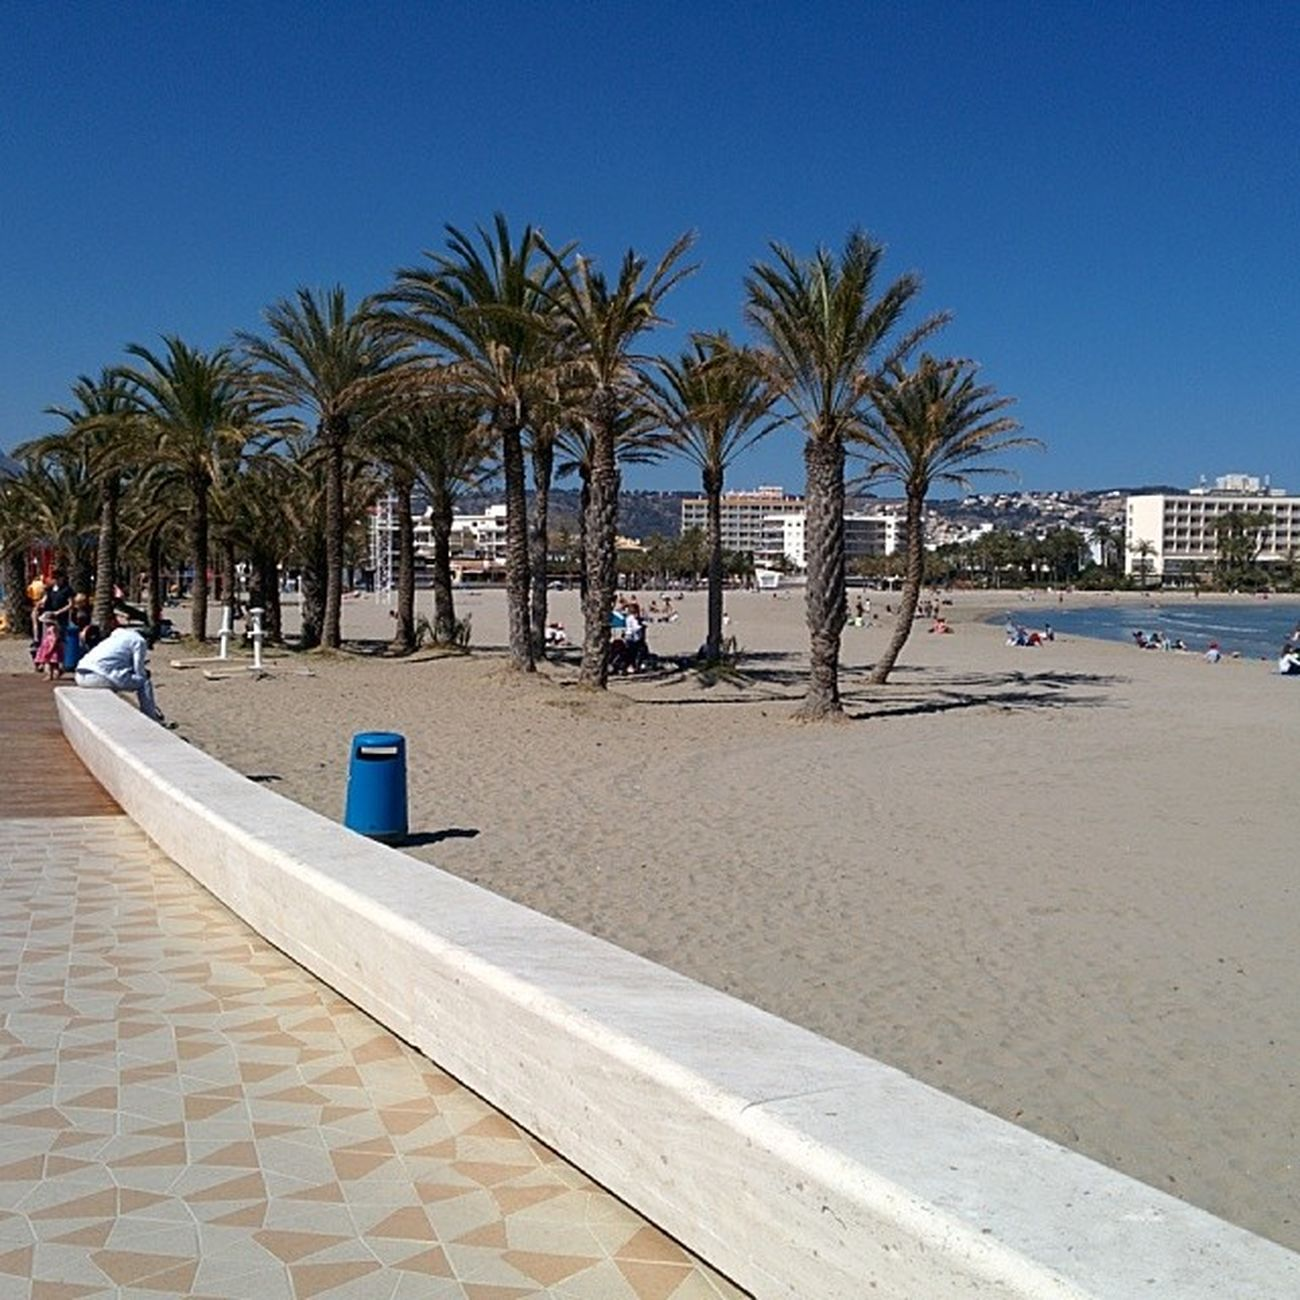 Playa de Javea! Aitoespanja Ranta Playa Beach sand palms palmera palmu